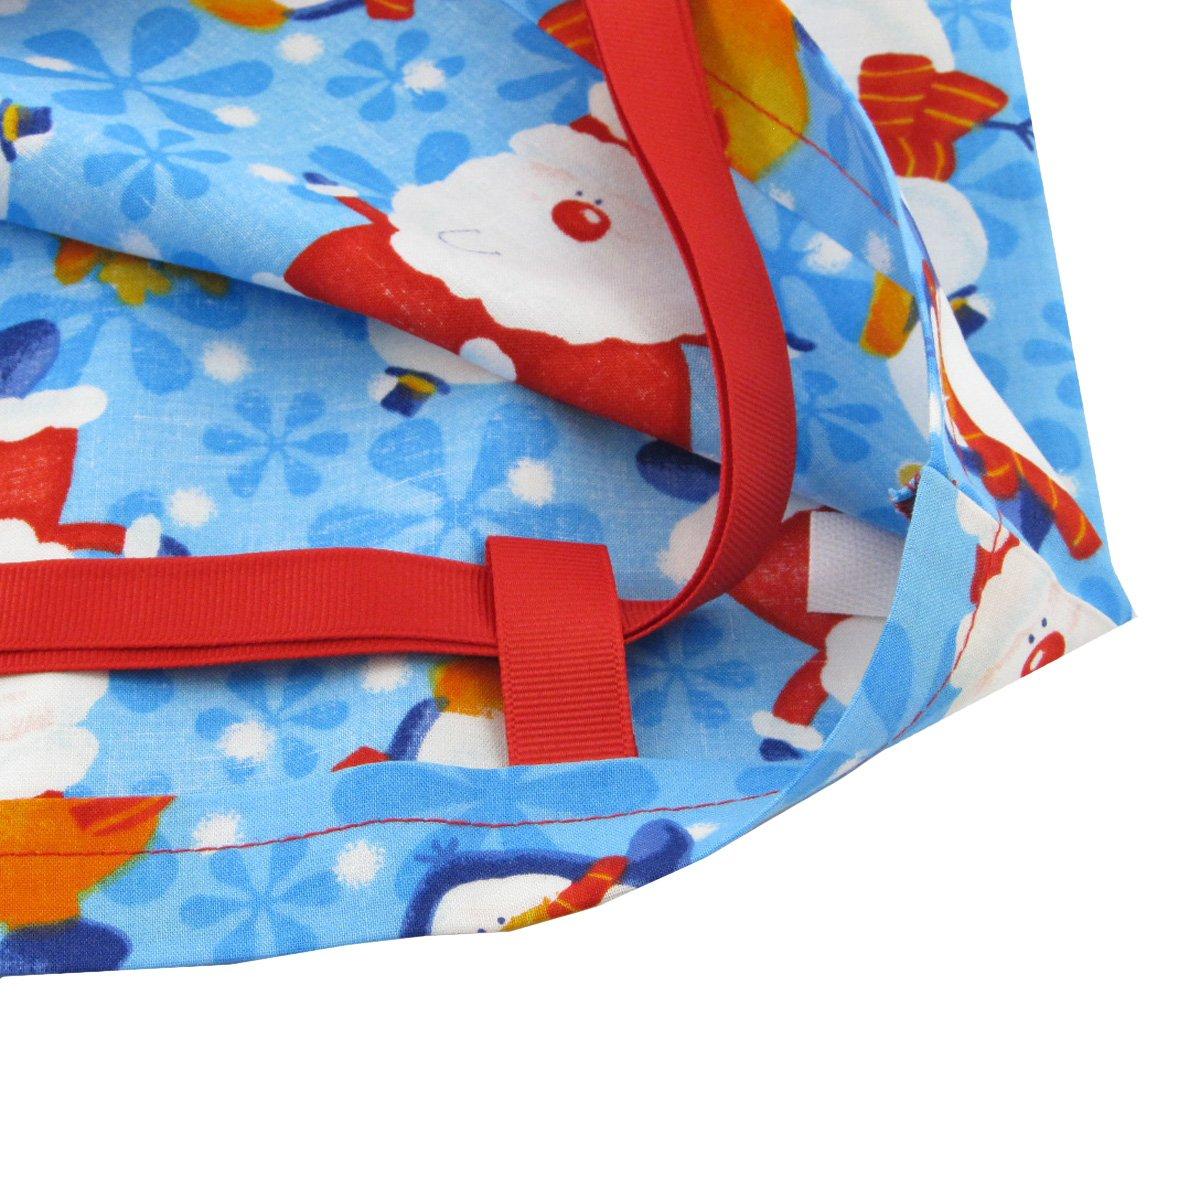 Amazon.com: Polo Norte Buddies reutilizable de Navidad bolsa ...